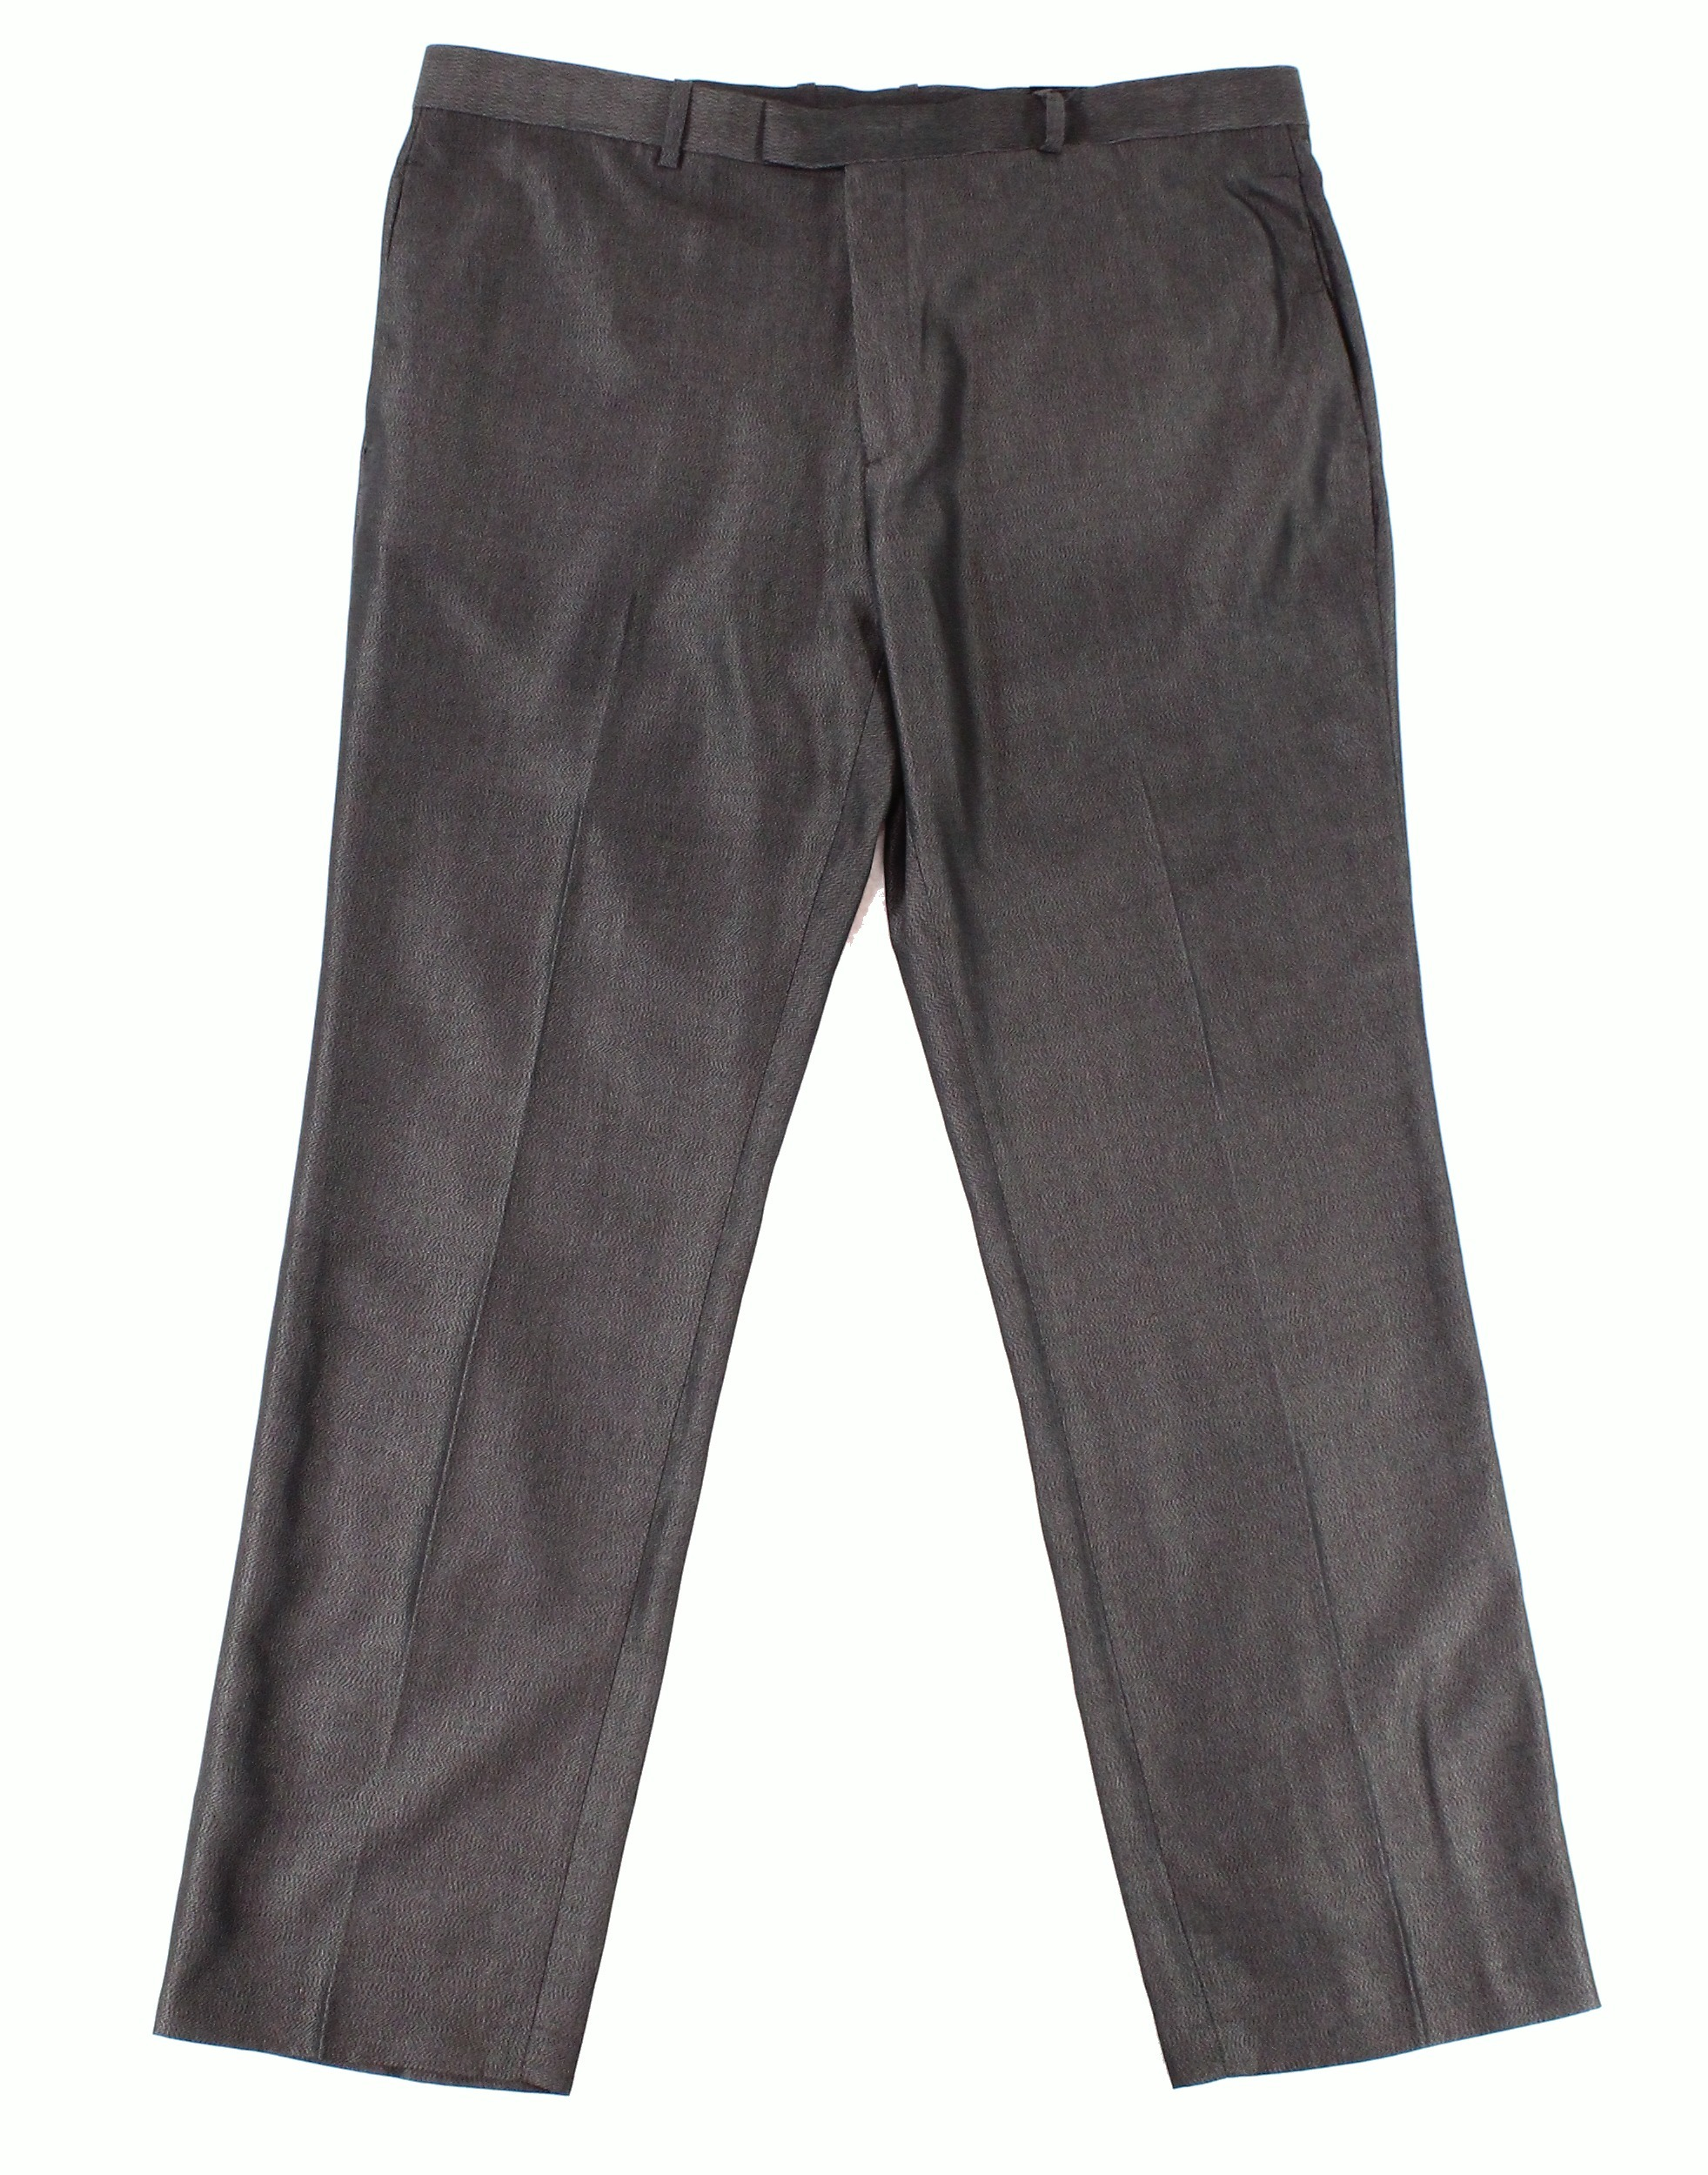 Alfani NEW Solid Deep Black Mens Size 36X29 Dress - Flat Front Pants